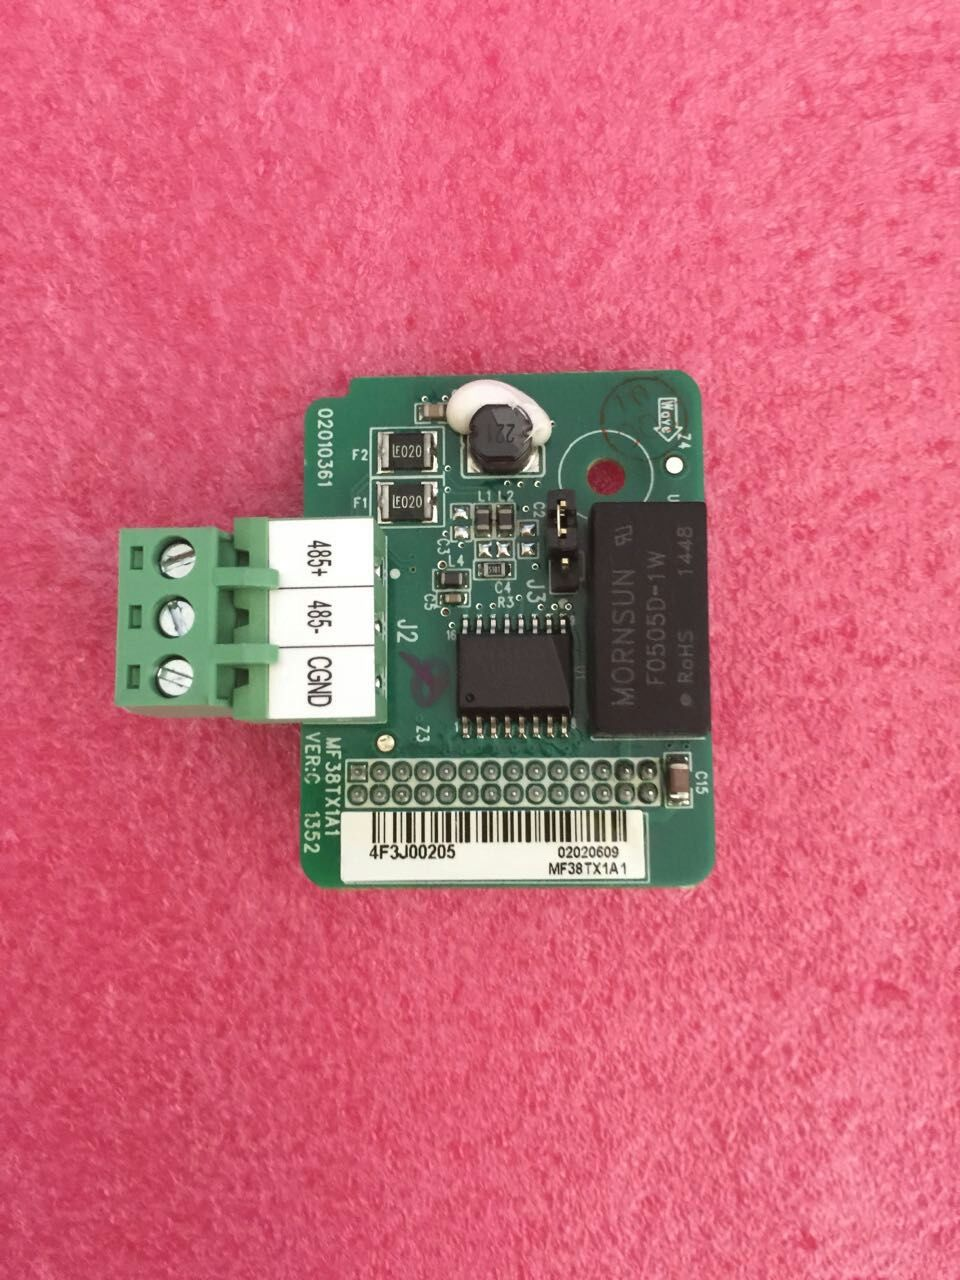 for Inovance inverter MD38TX1/MF38TX1A1for Inovance inverter MD38TX1/MF38TX1A1